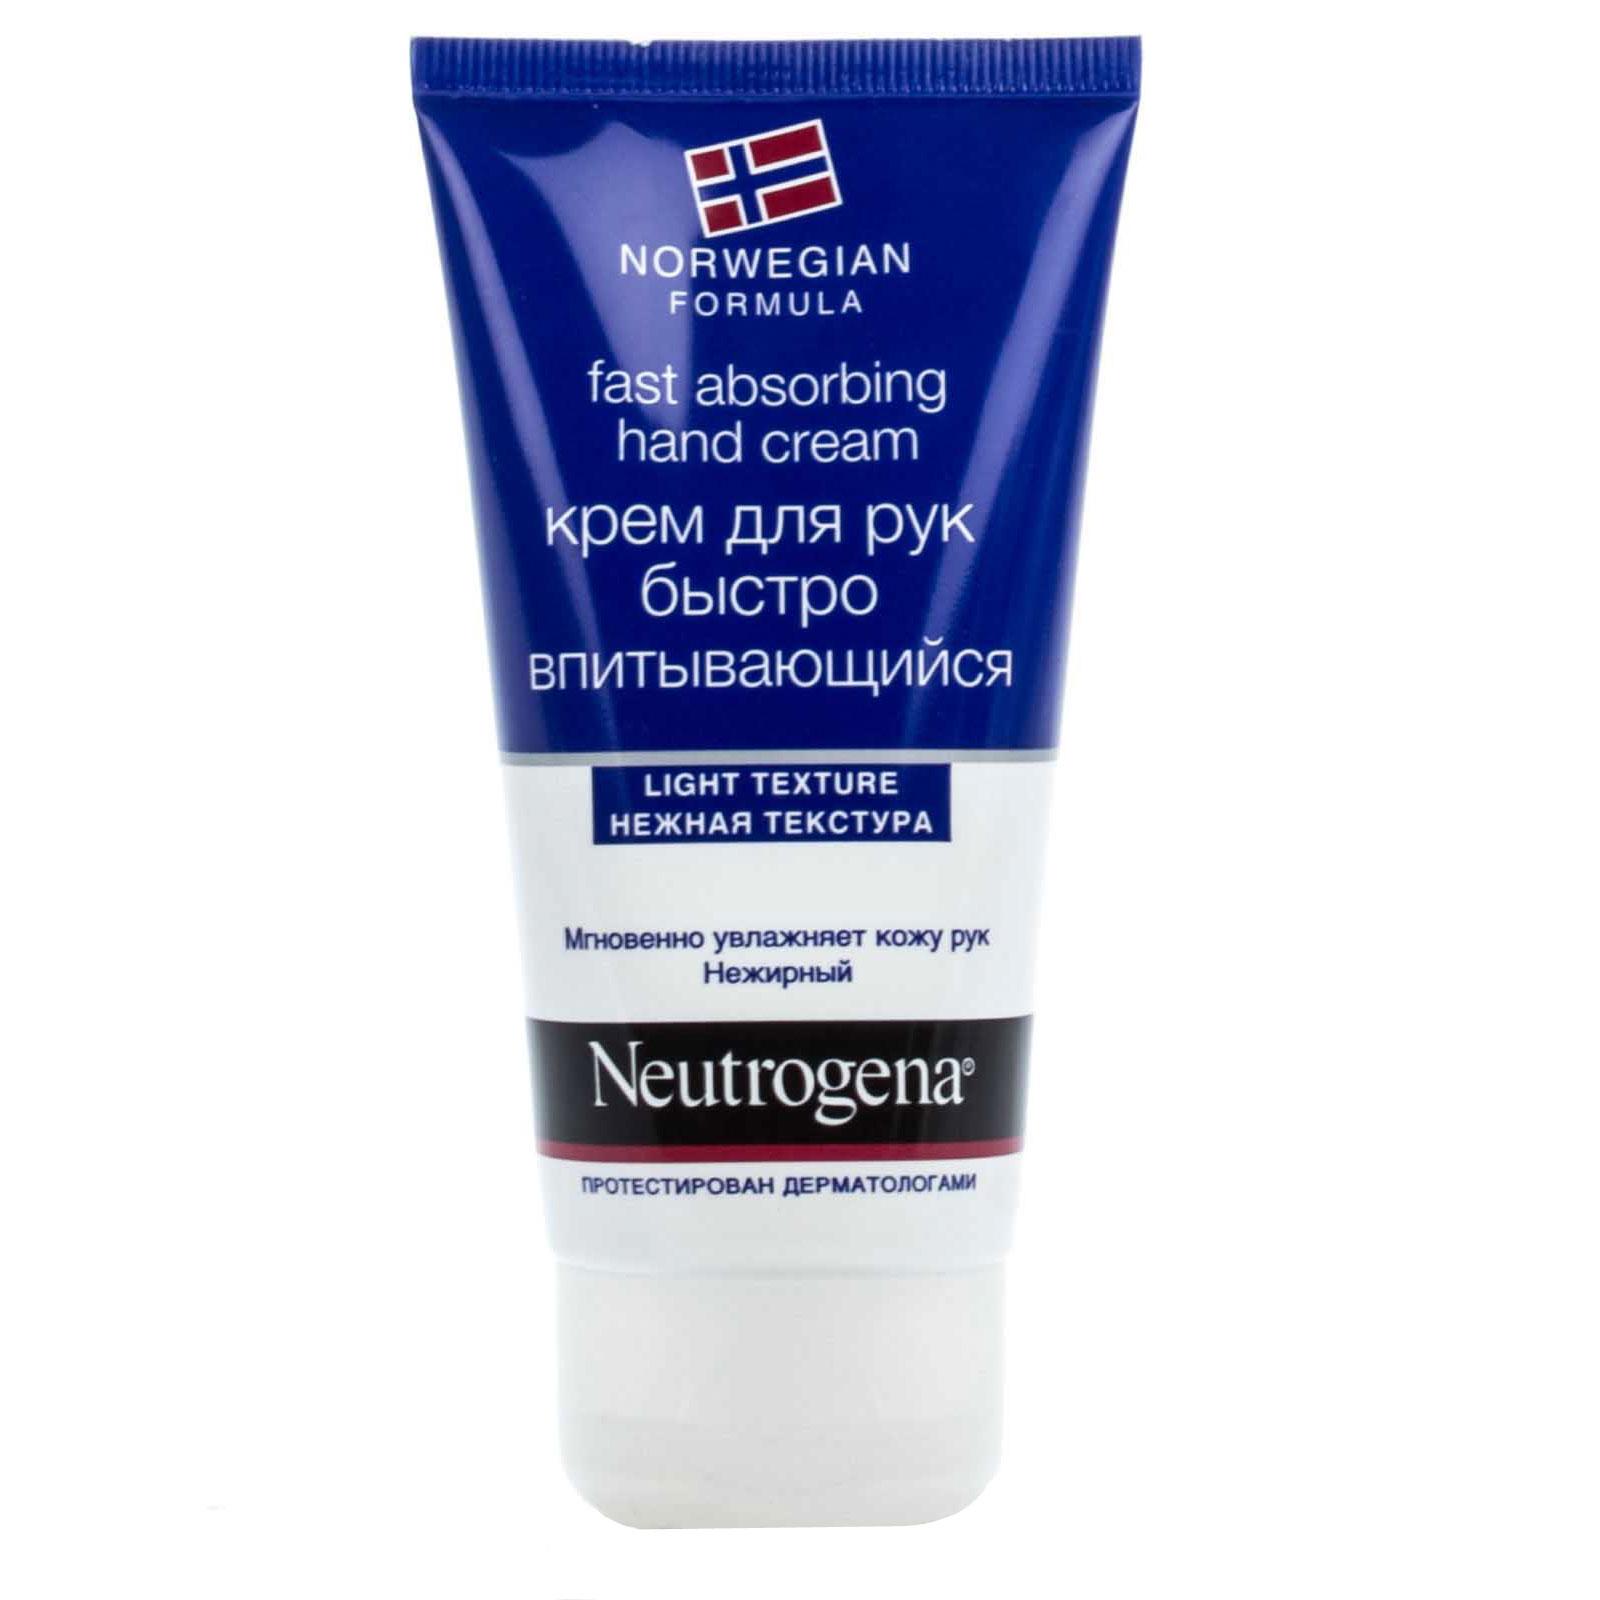 Крем для рук Neutrogena Норвежская Формула быстро впитывающийся 75 мл<br>